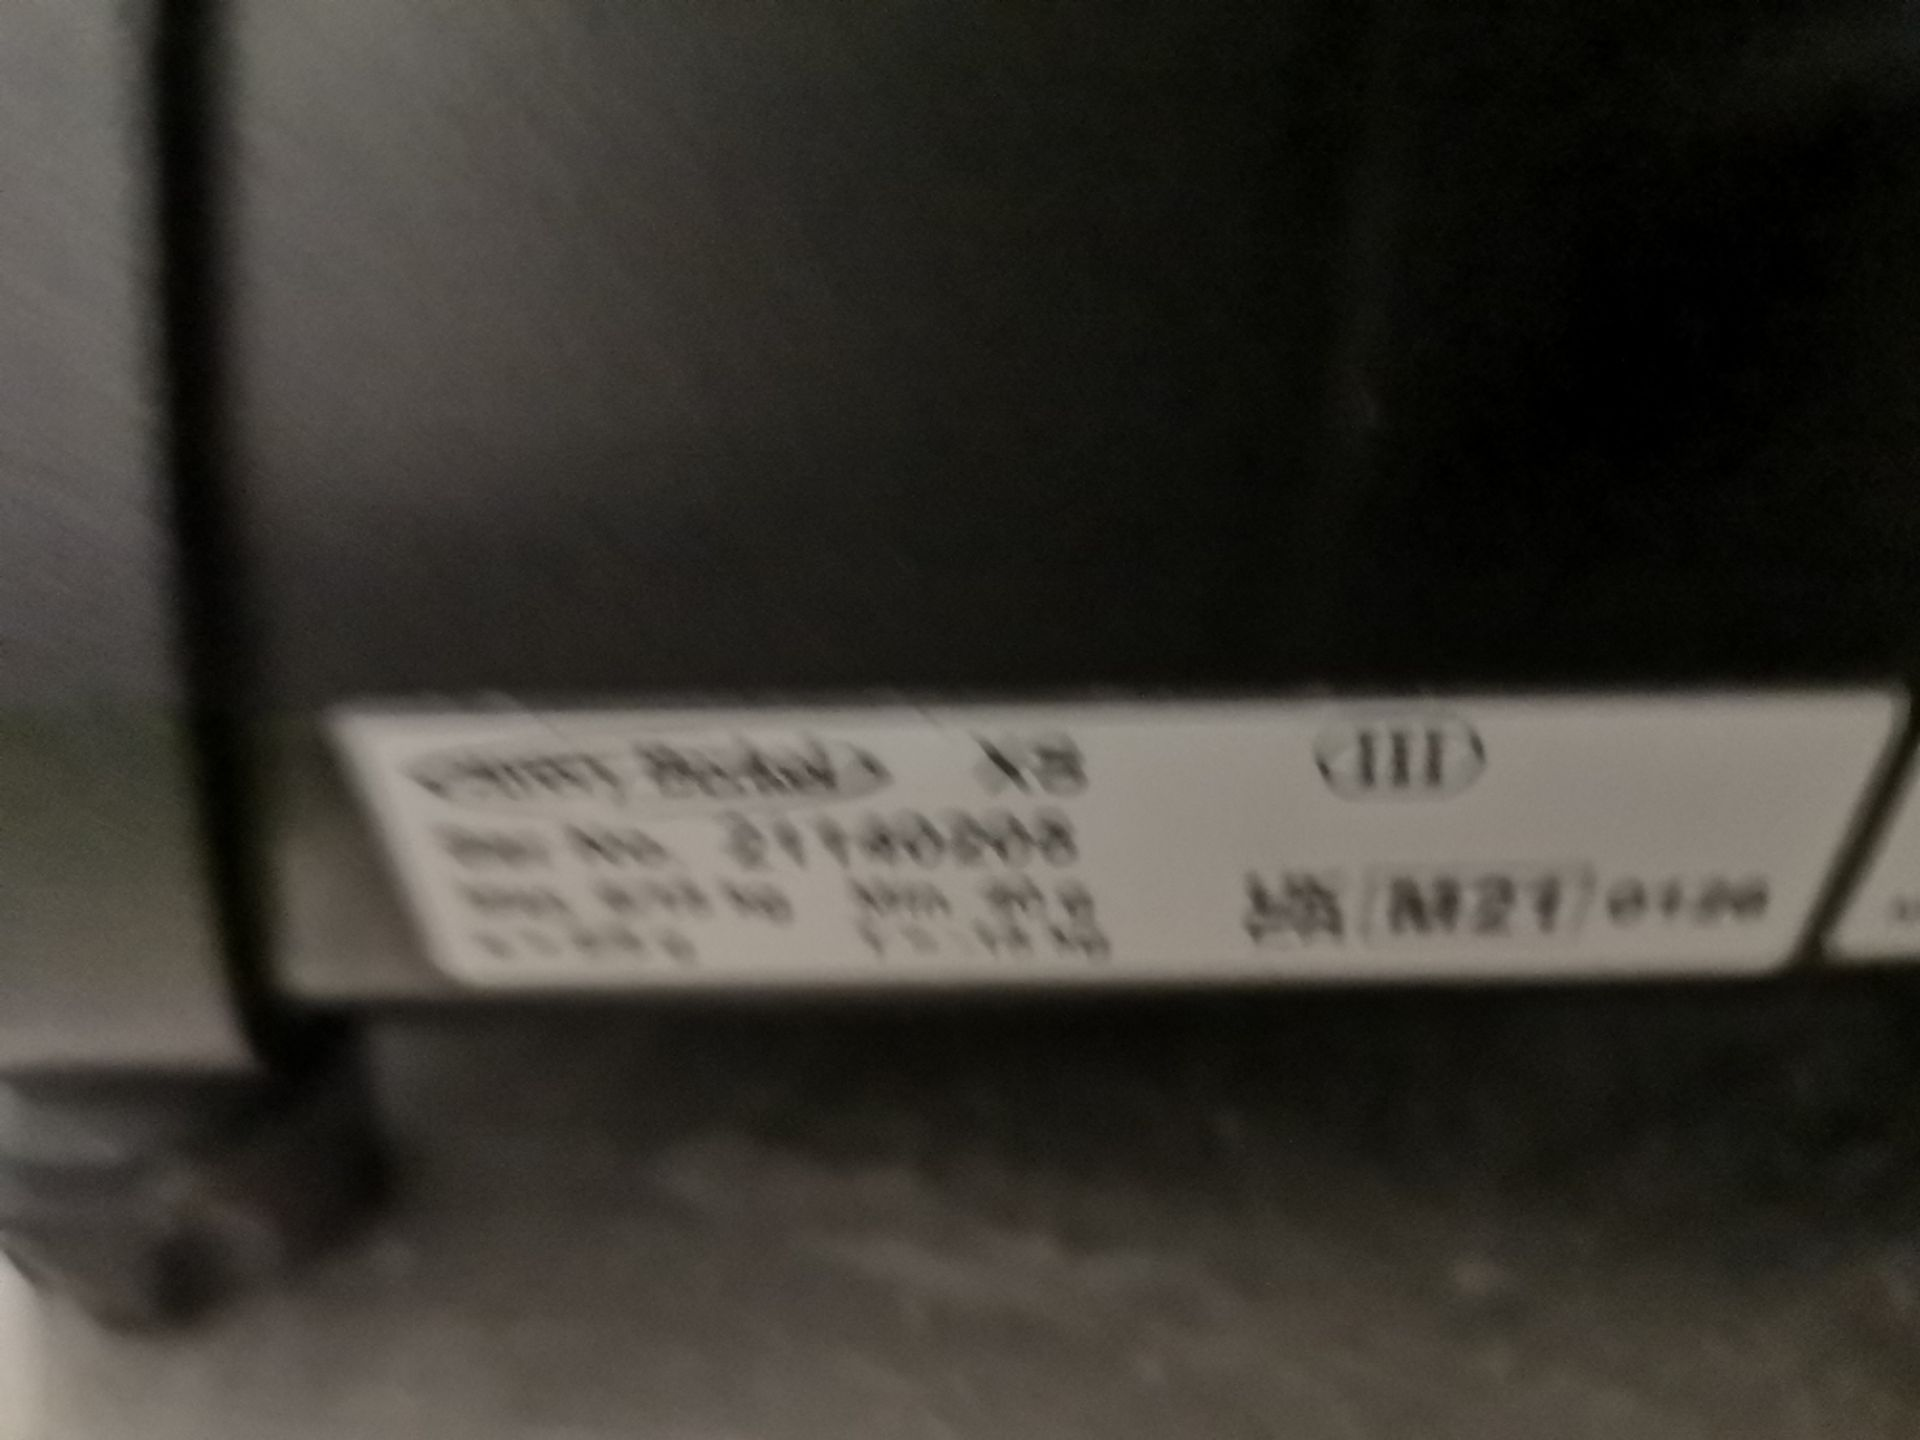 Avery Berkel XS100 Label & Receipt Printing Scale - Image 4 of 4